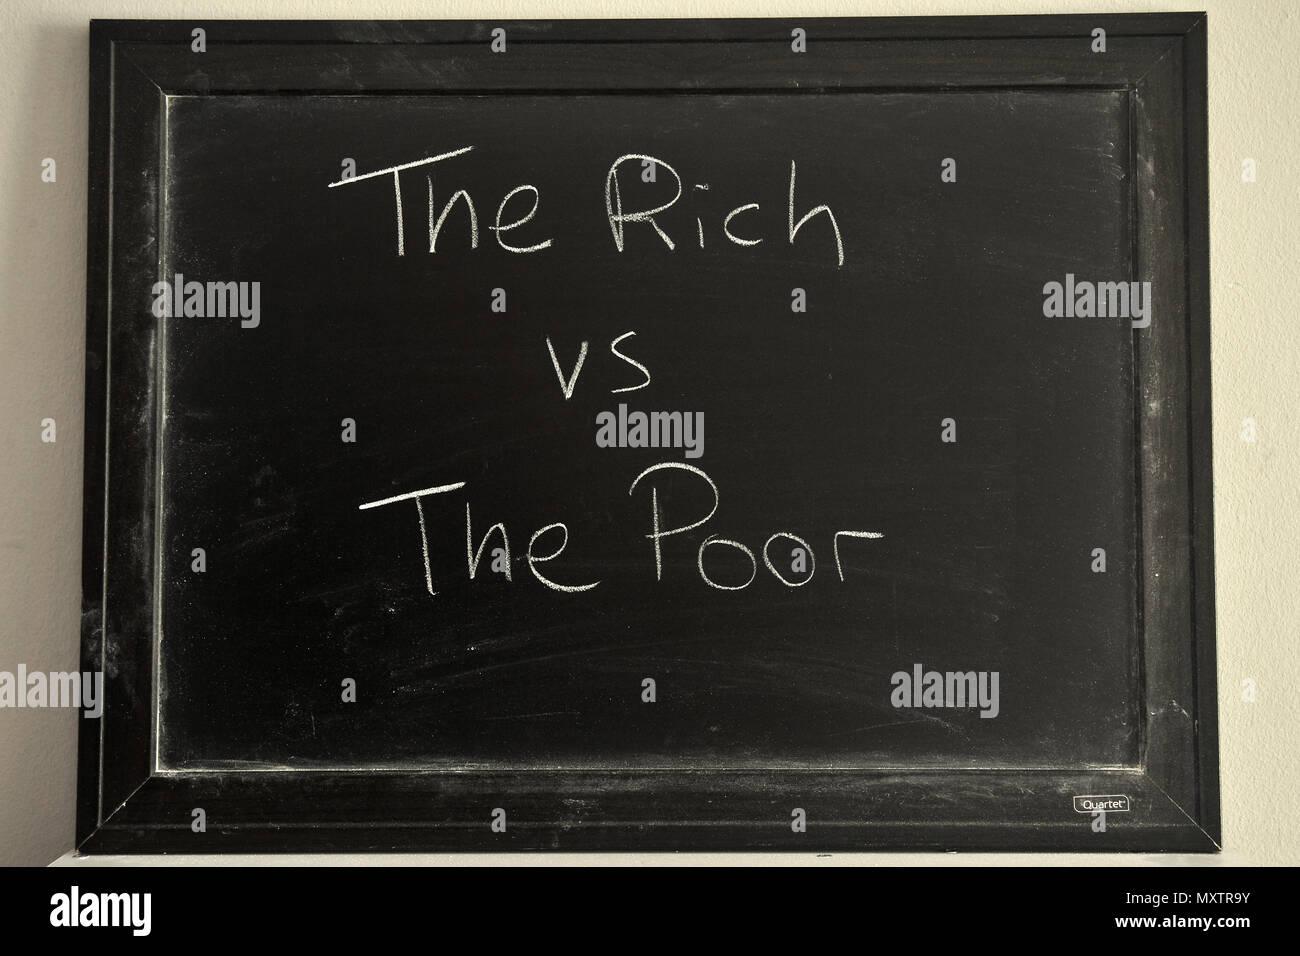 The Rich vs The Poor written in white chalk on a blackboard. - Stock Image